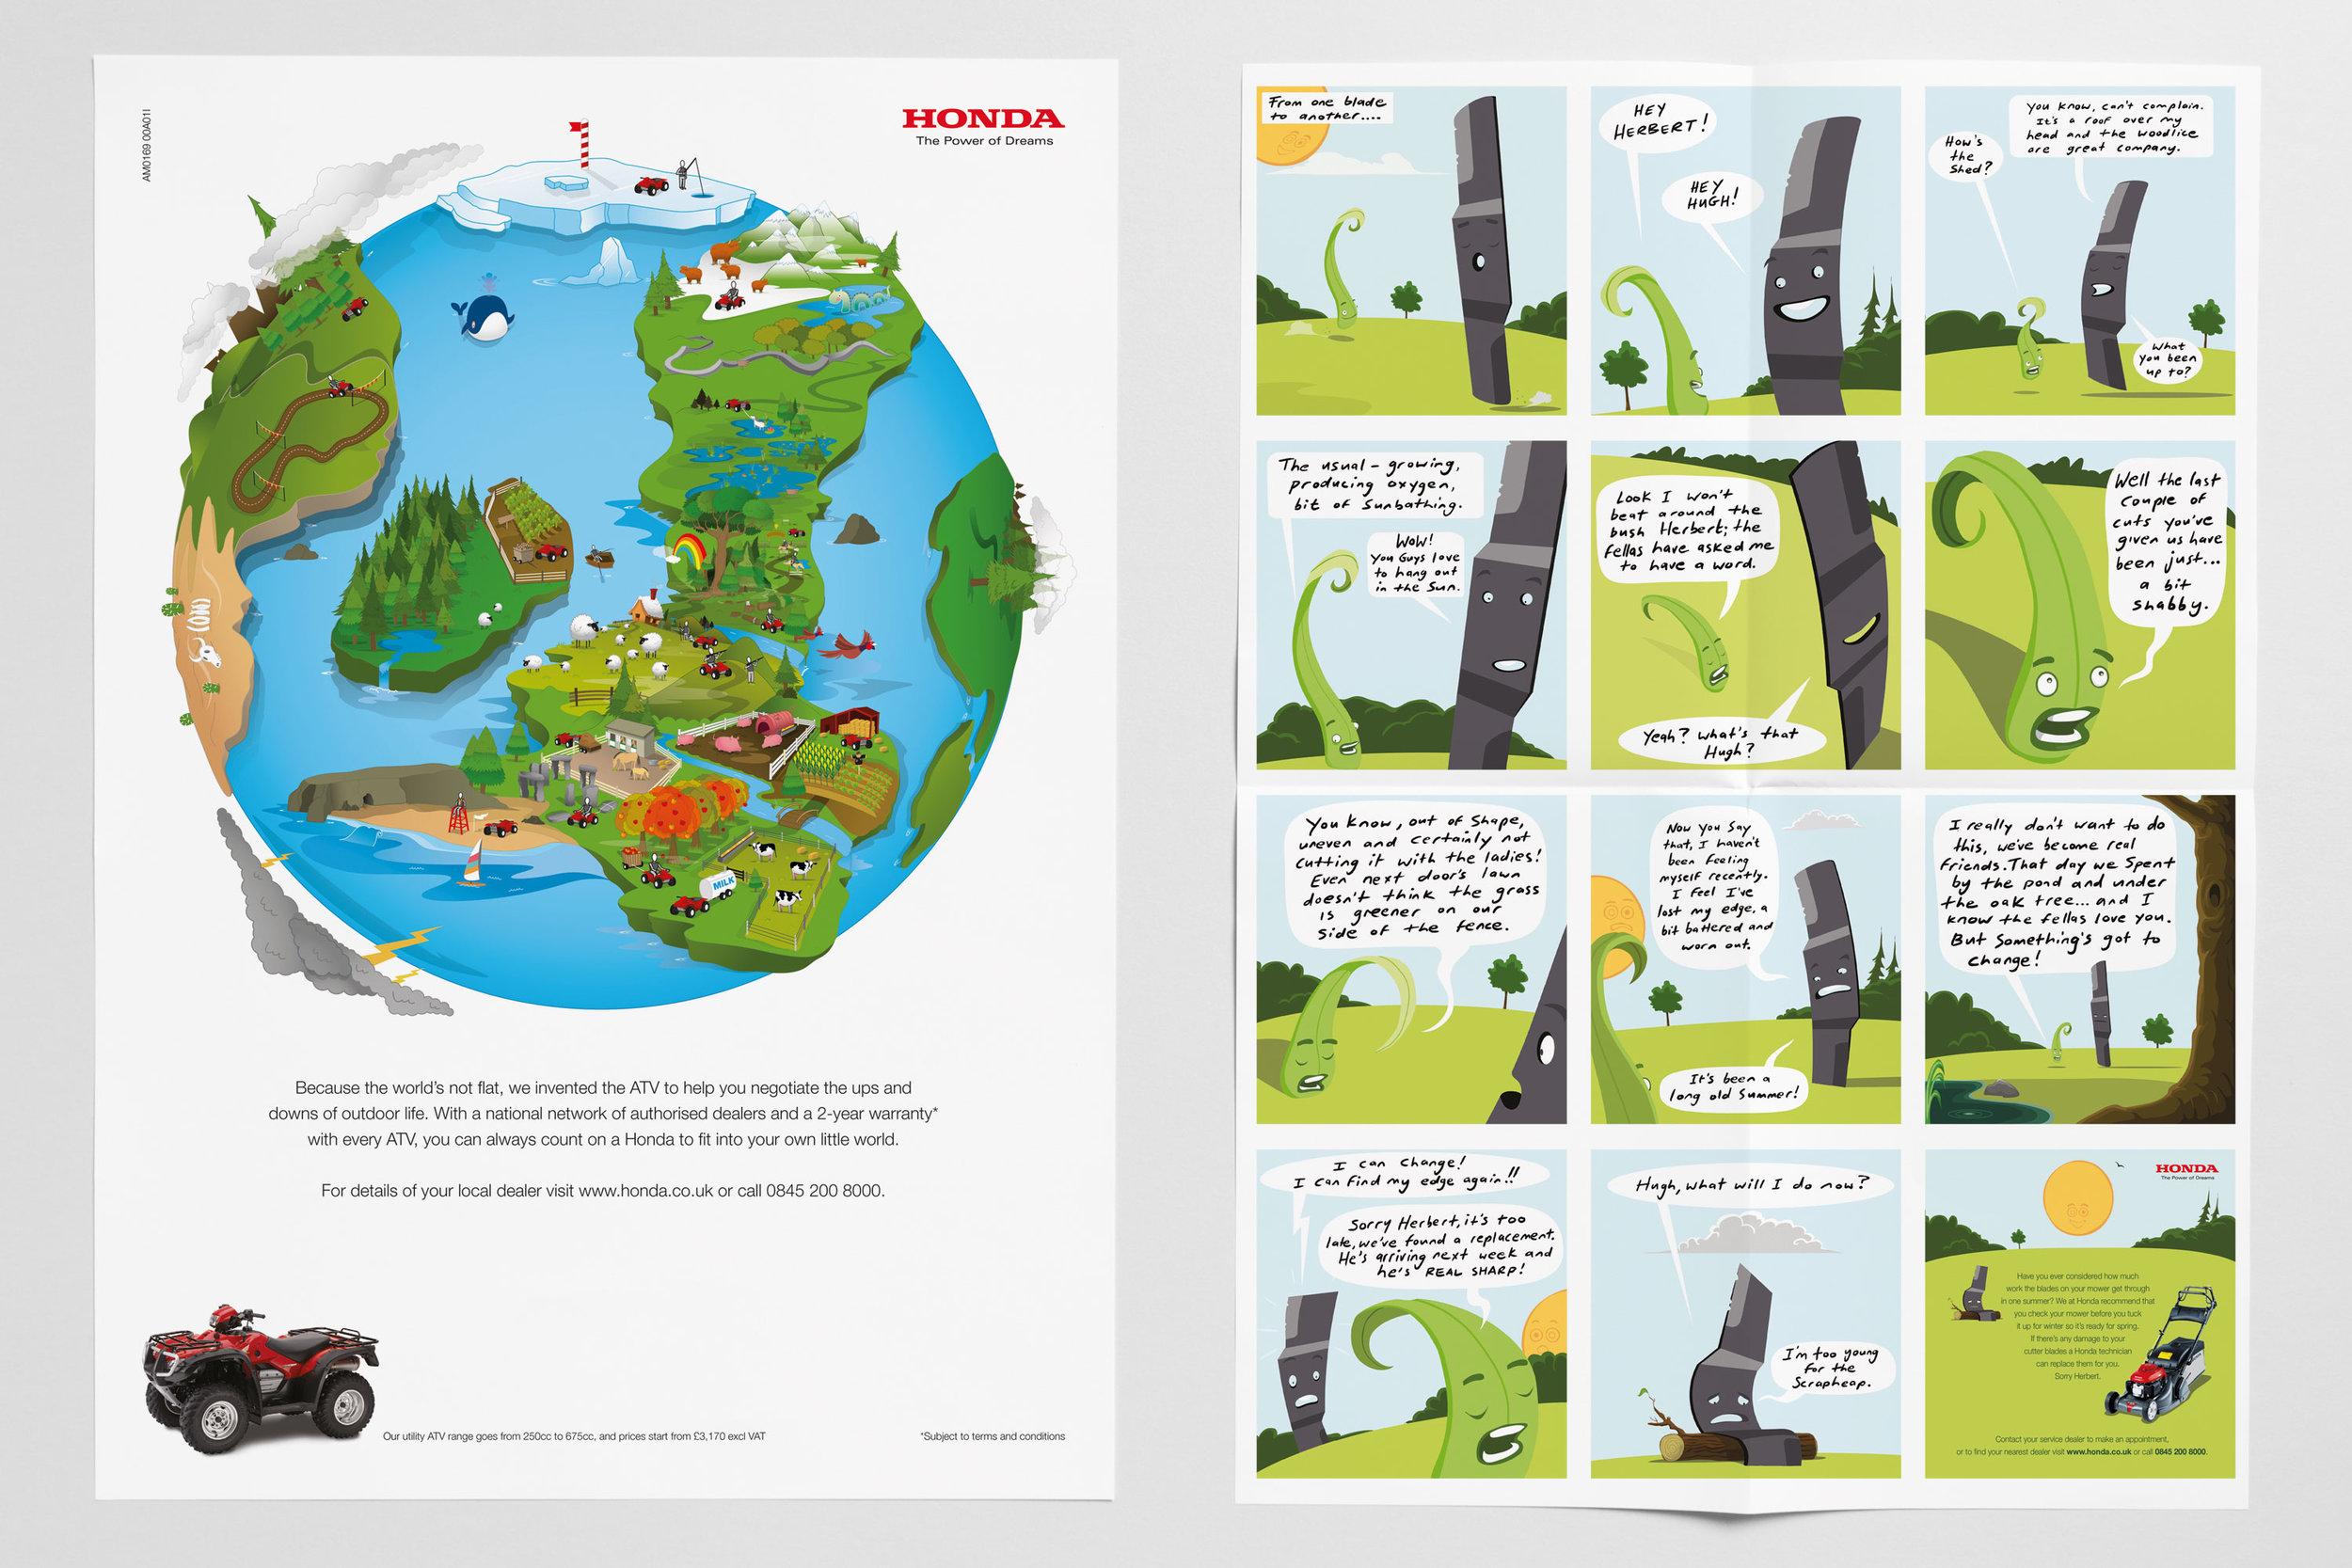 Honda-ATV-lawn-mower-posters-3000x2000-nick-dellanno-2018.jpg